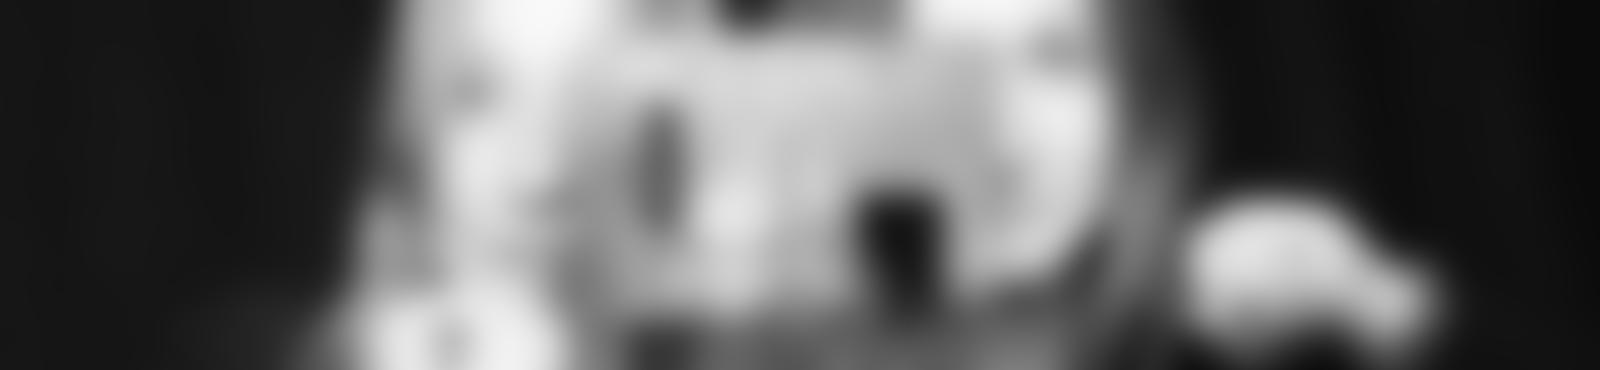 Blurred 760f9e98 4aff 4150 8e76 9b5a69c43e16